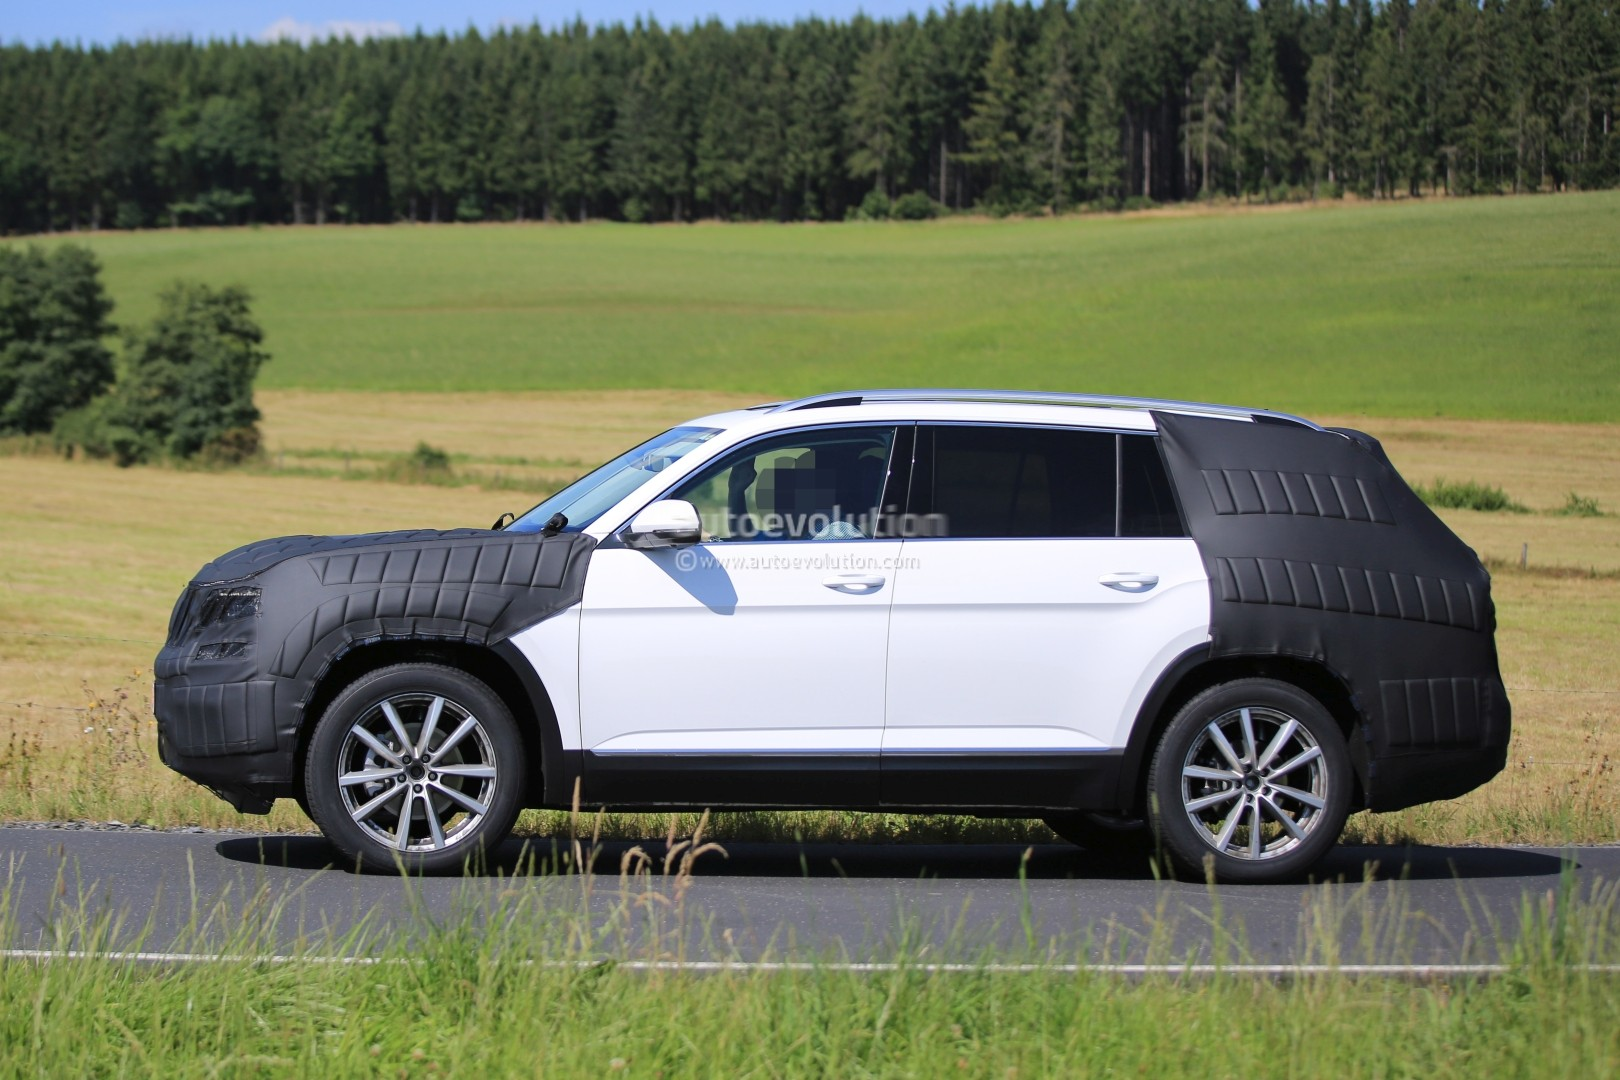 Mercedes 7 Seater Suv >> 2017 Volkswagen 7-Seater US Market SUV Spied Testing Its Extended Golf Platform - autoevolution